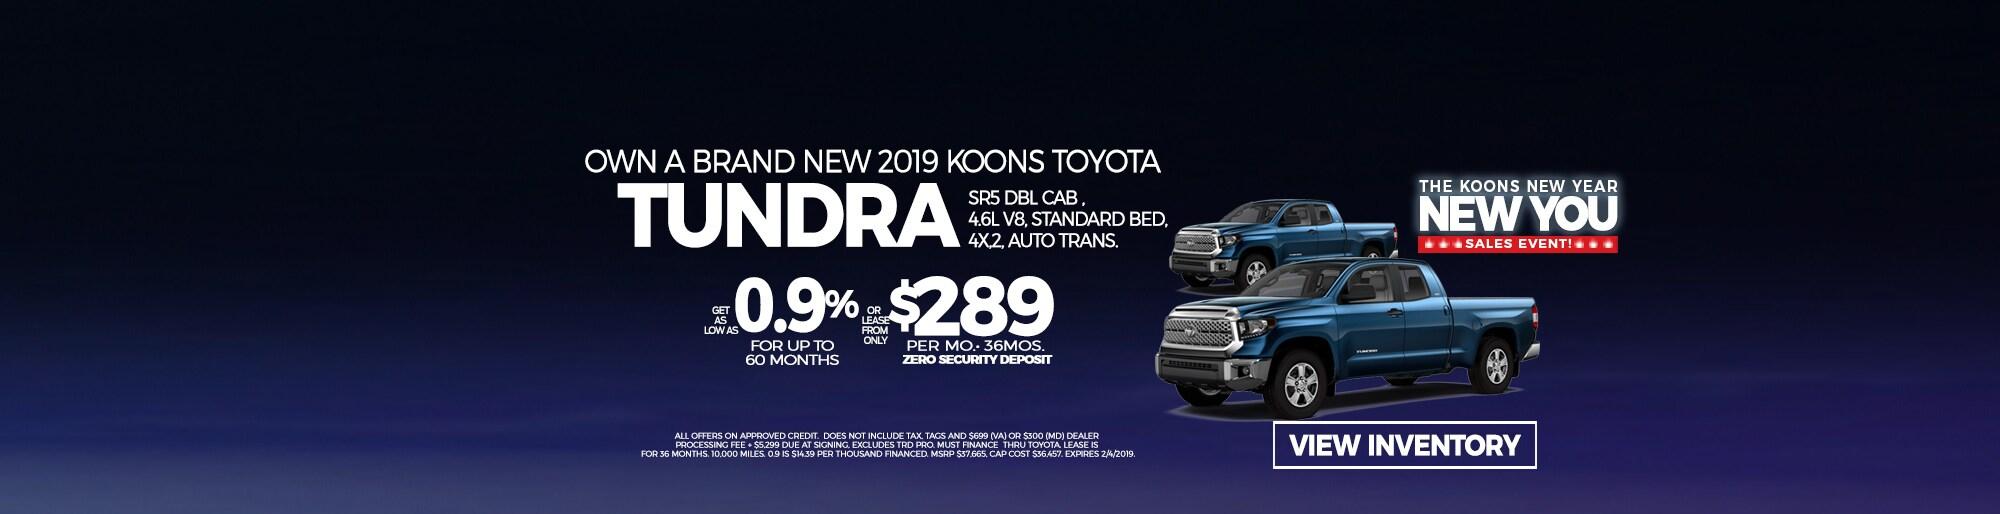 Koons Arlington Toyota Toyota Dealership In Arlington Serving Virginia